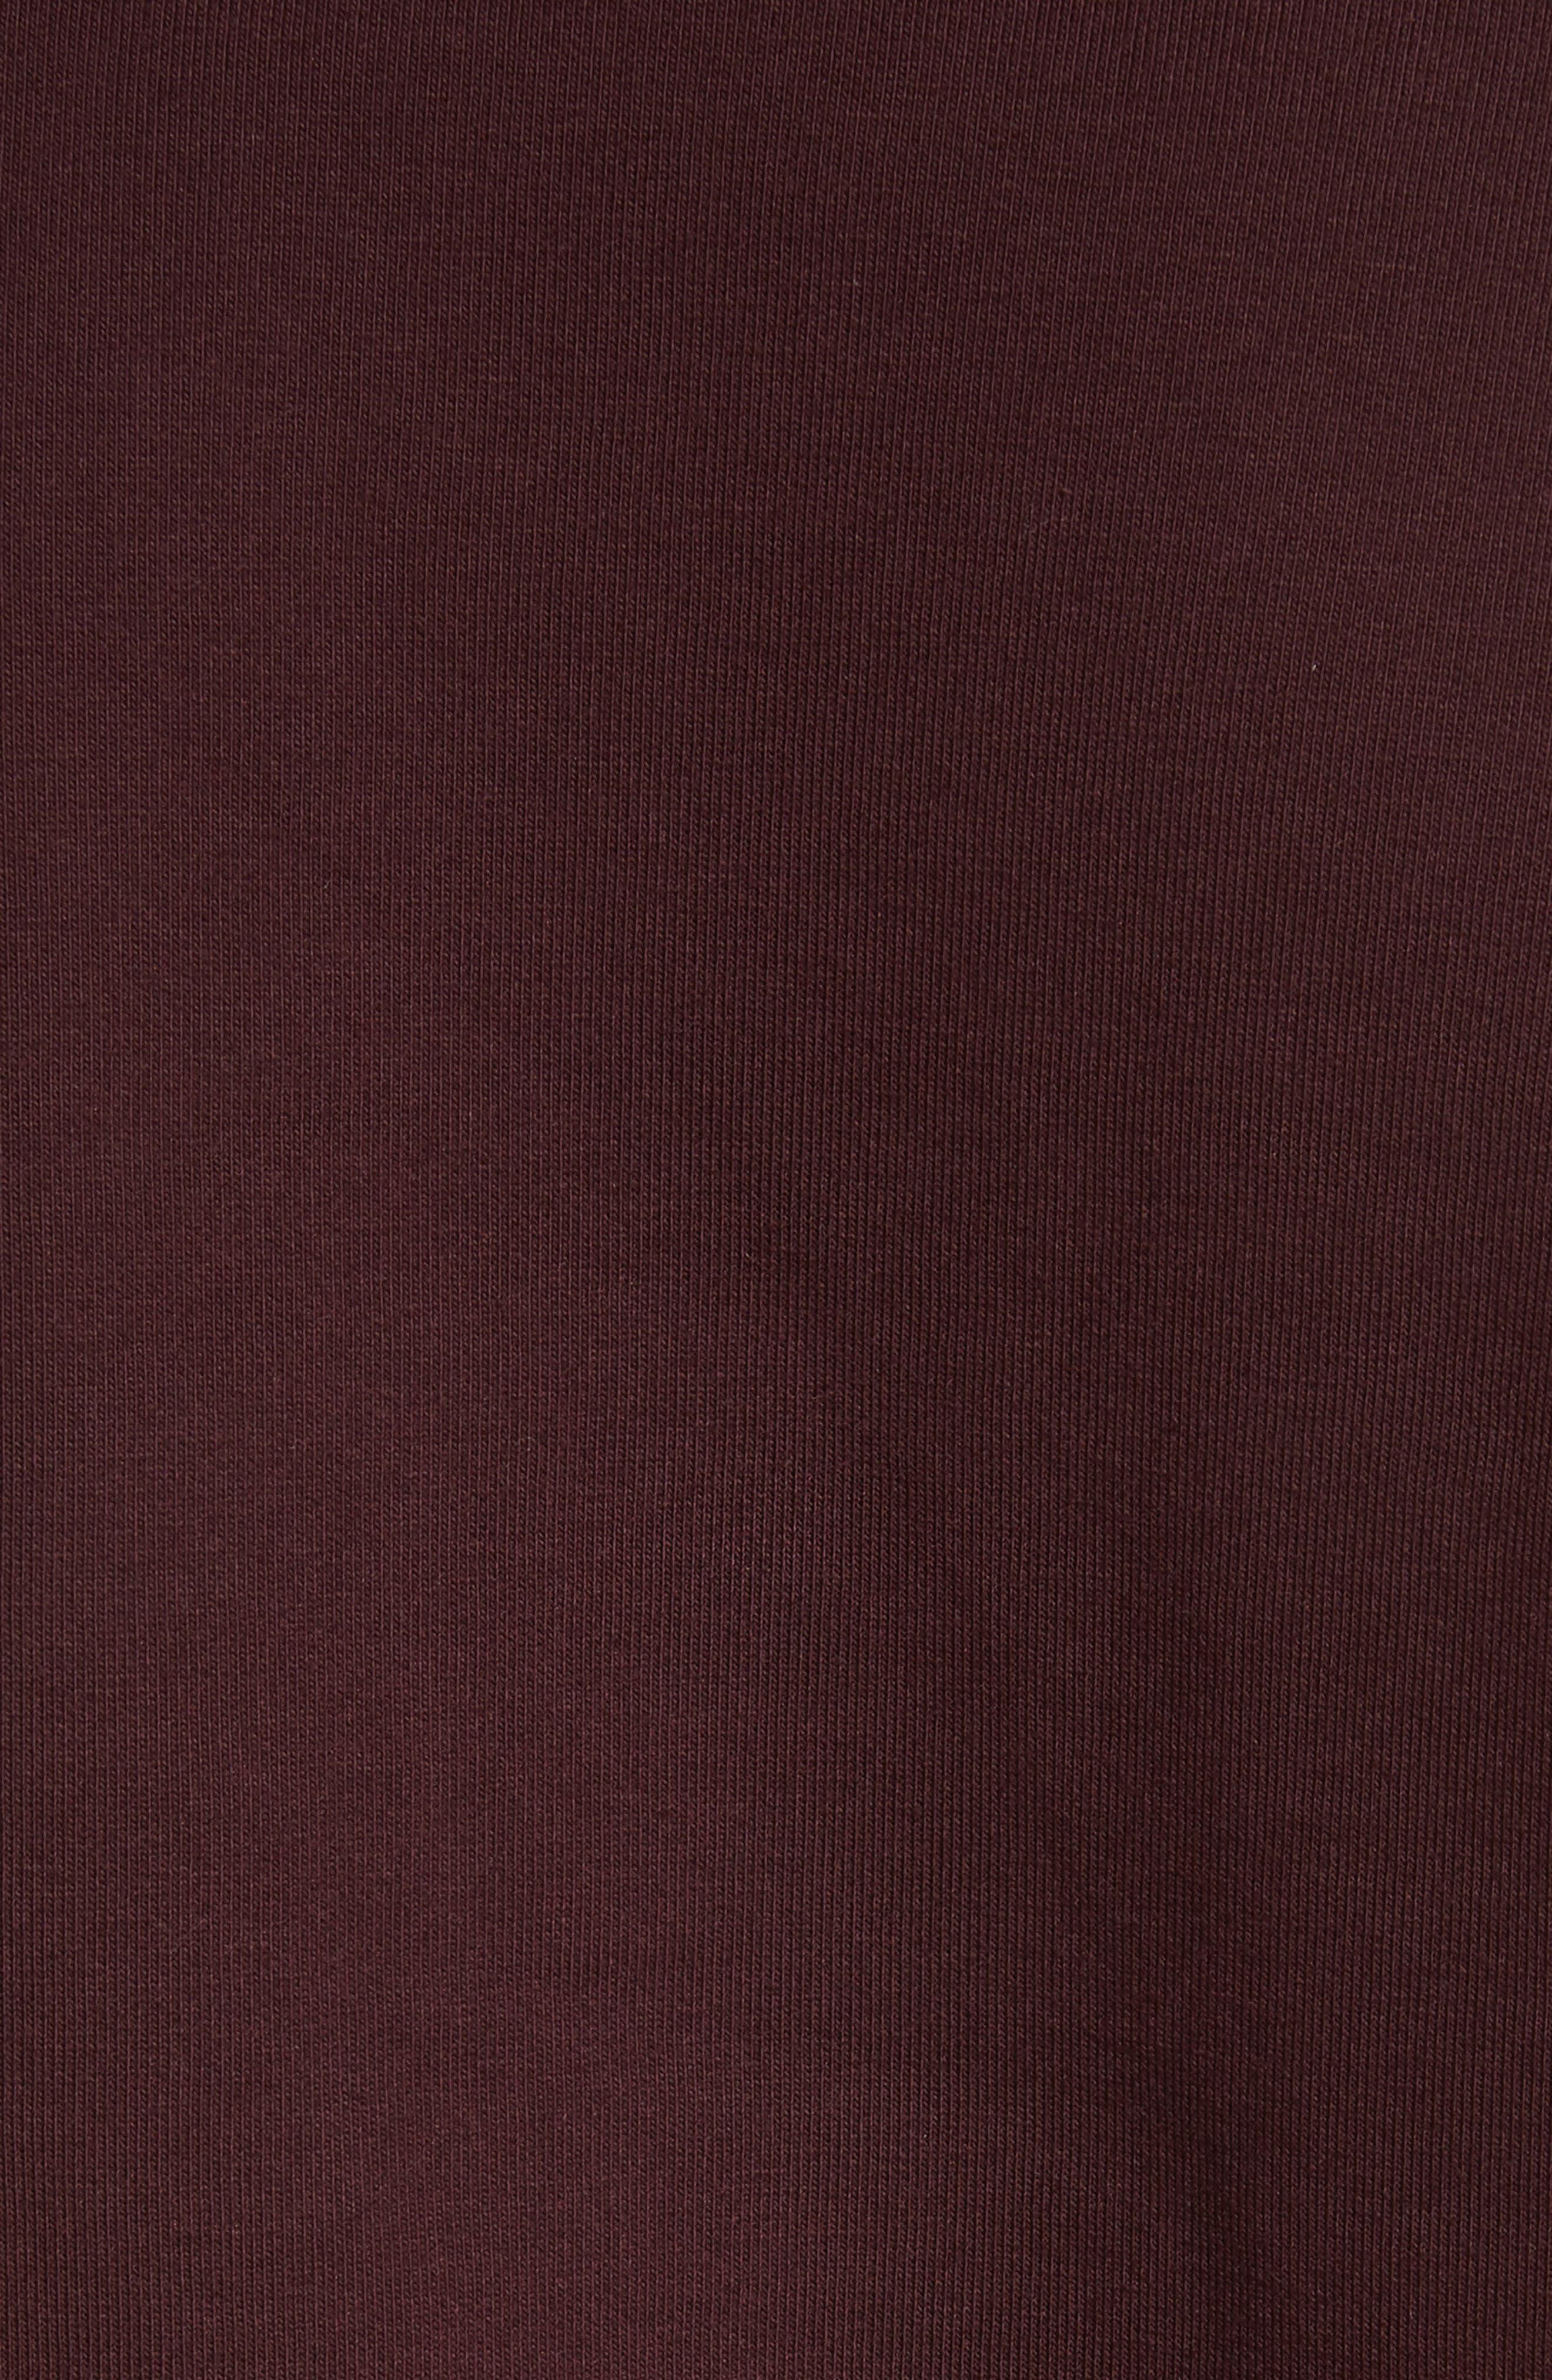 Crewneck Sweatshirt,                             Alternate thumbnail 5, color,                             Damson/ Gold